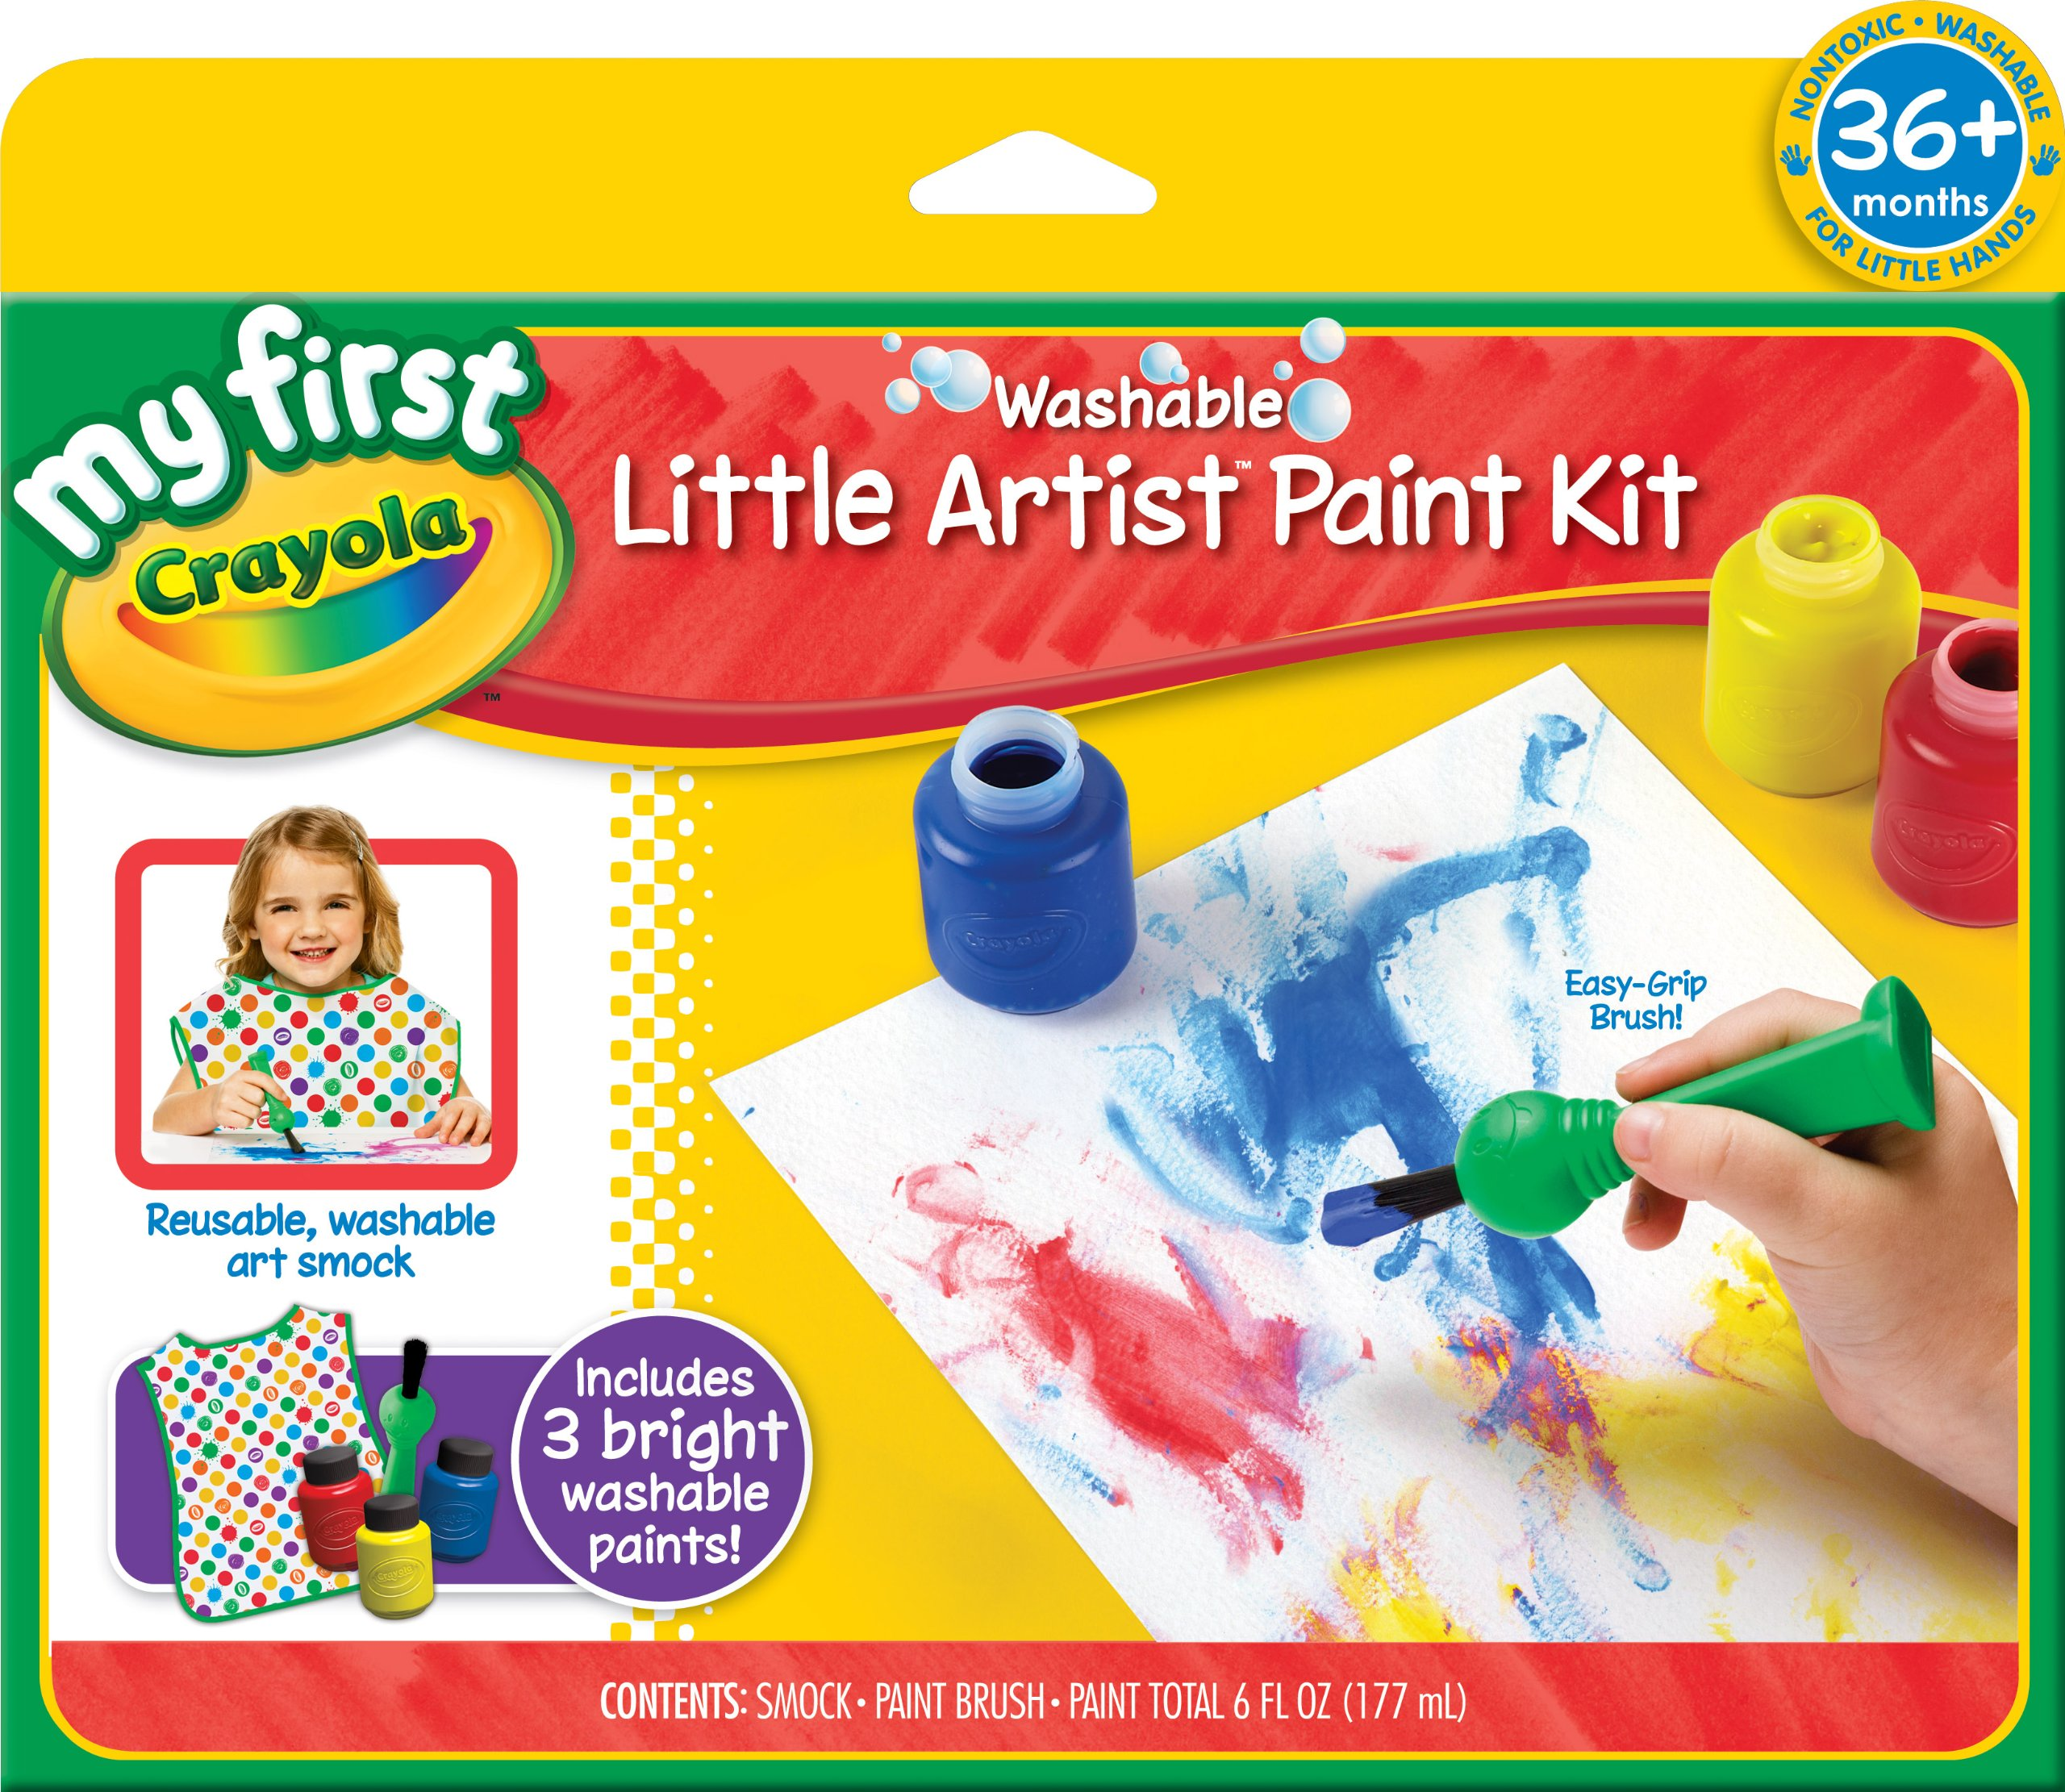 Crayola My First Crayola Painting Kit